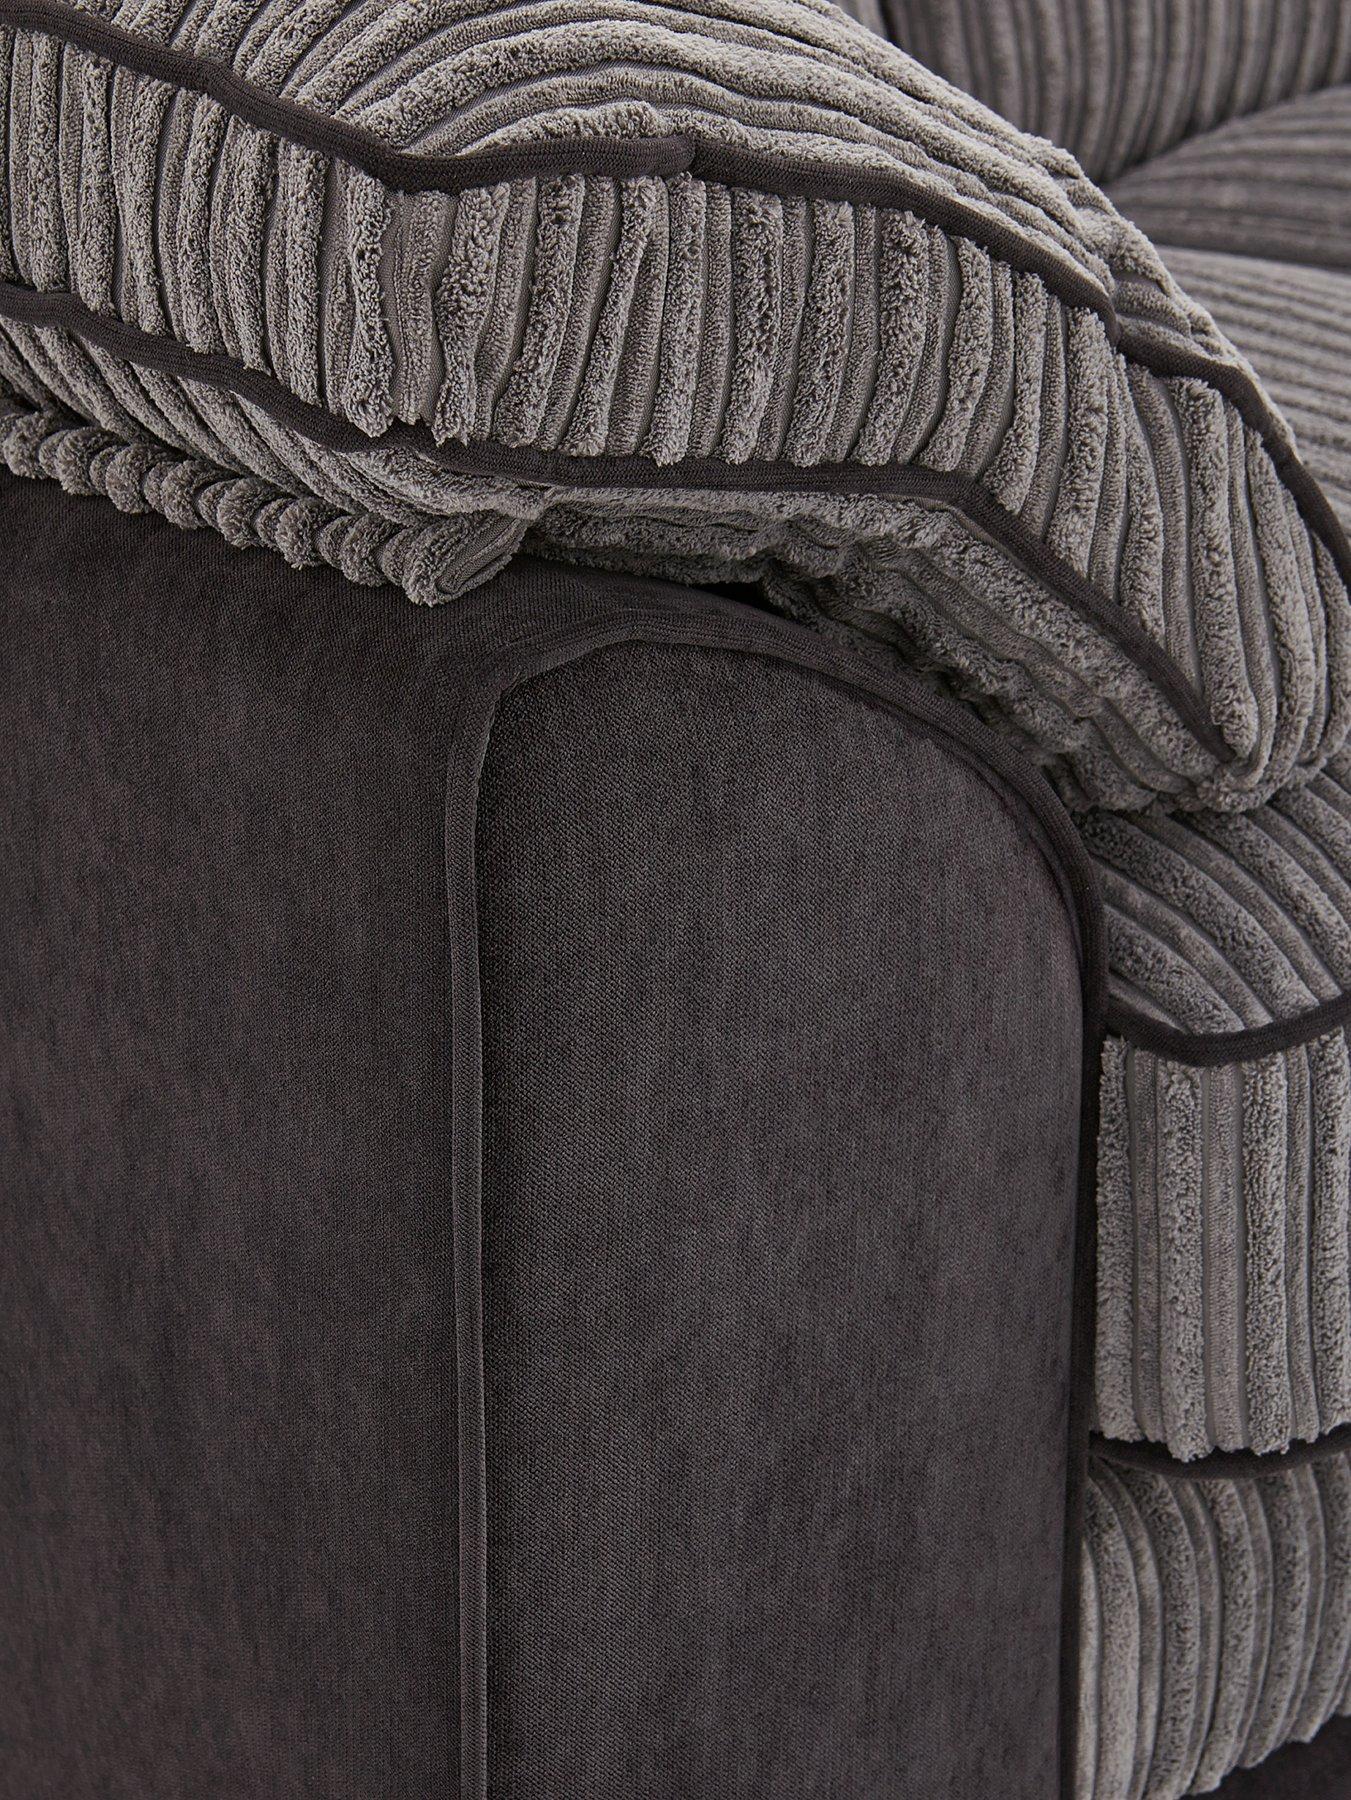 Delta 3 Seater Chaise Sofa Bristol Beds Divan Beds Pine Beds  # Meuble Tv Bristol